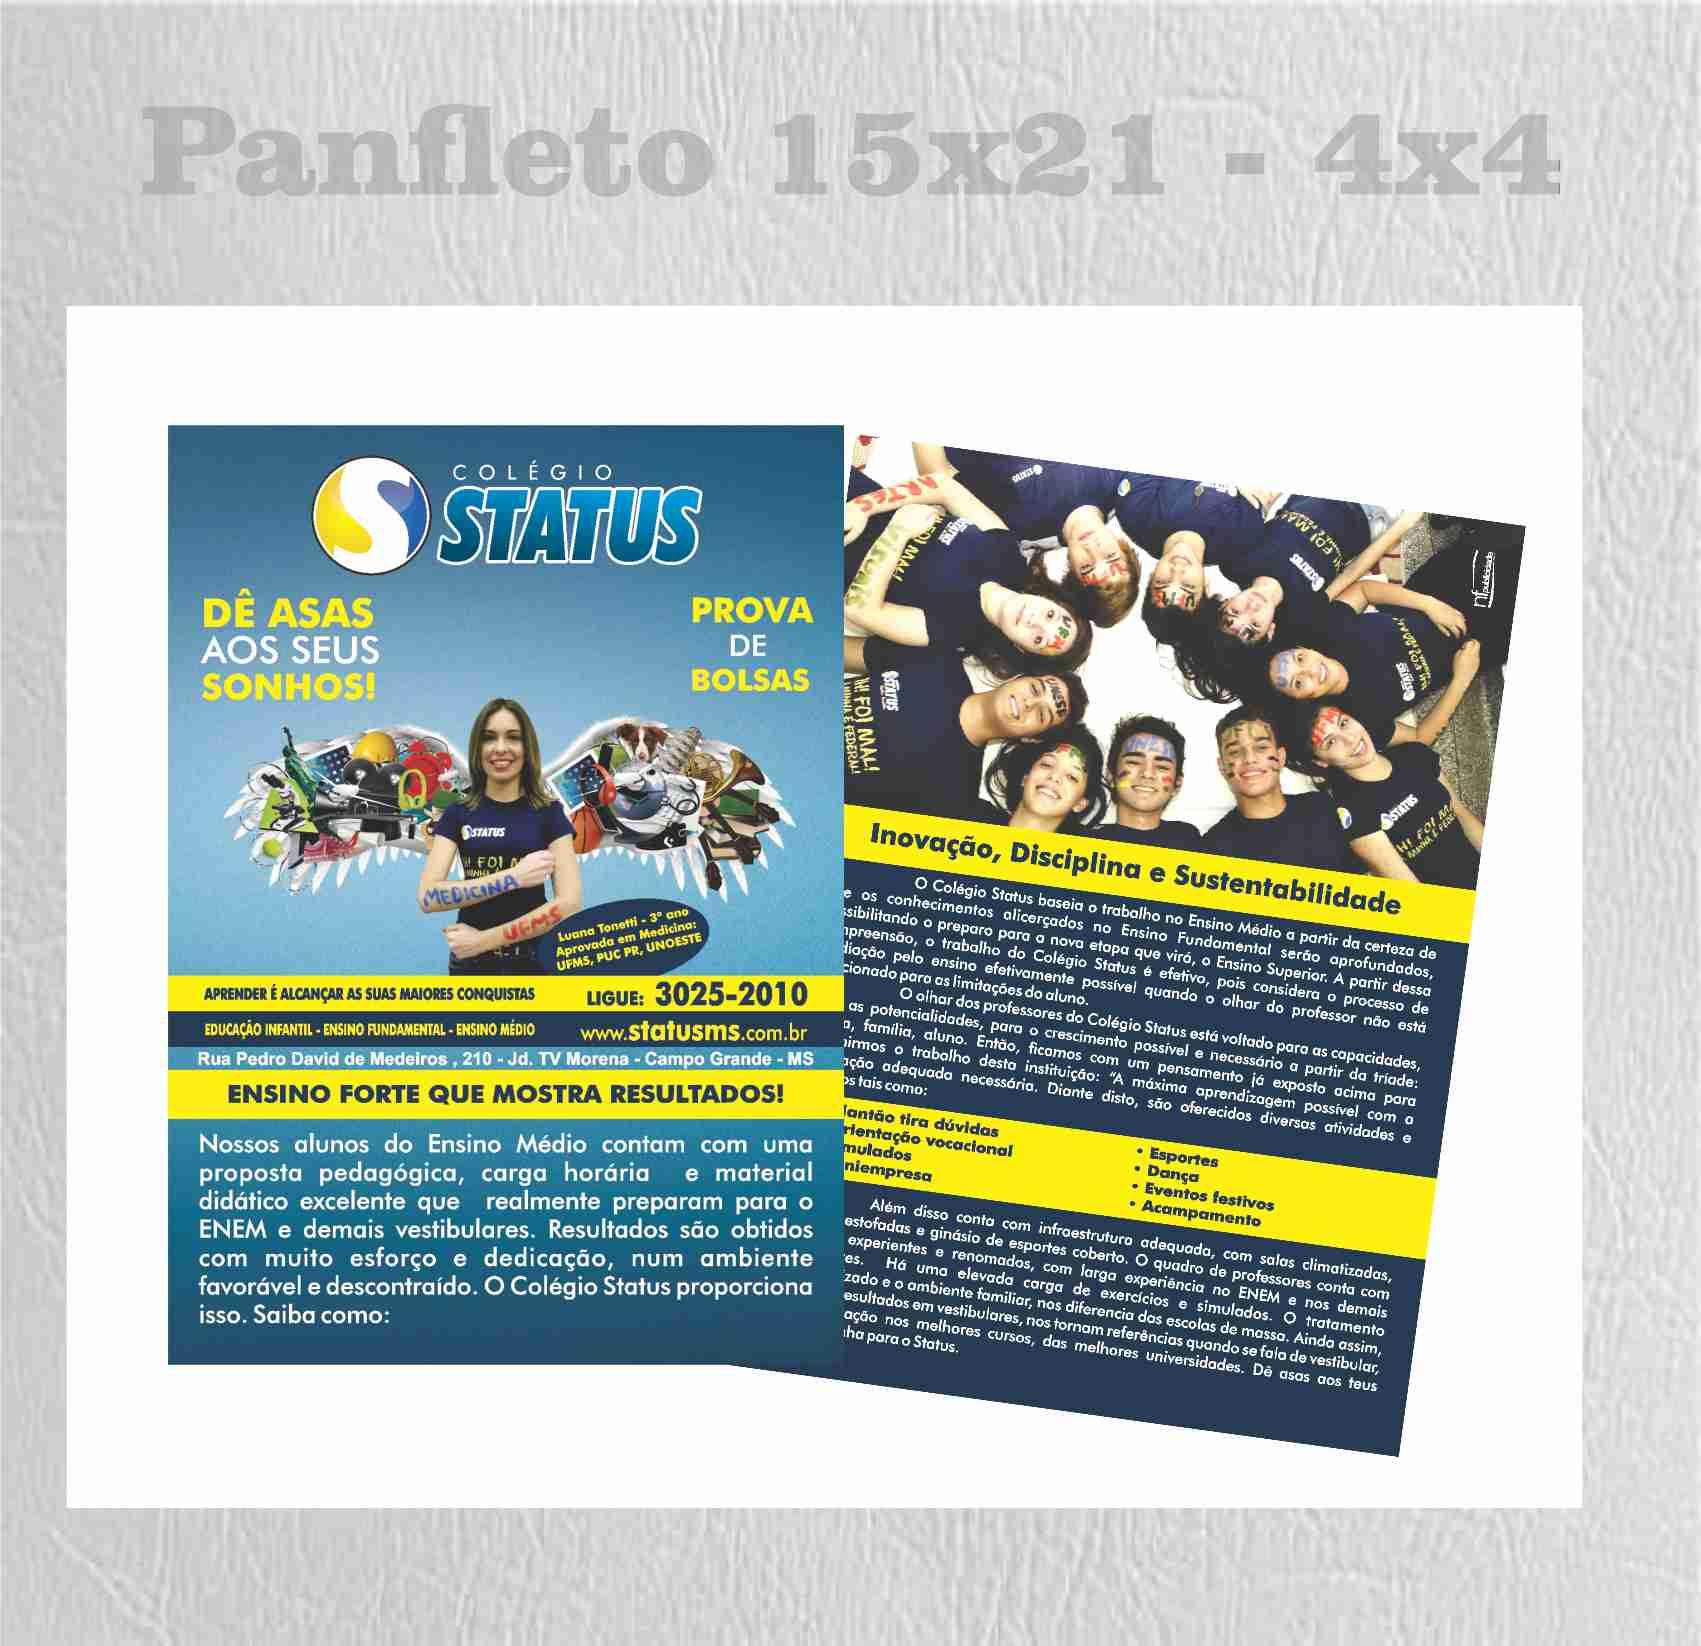 STATUS PANFLETO